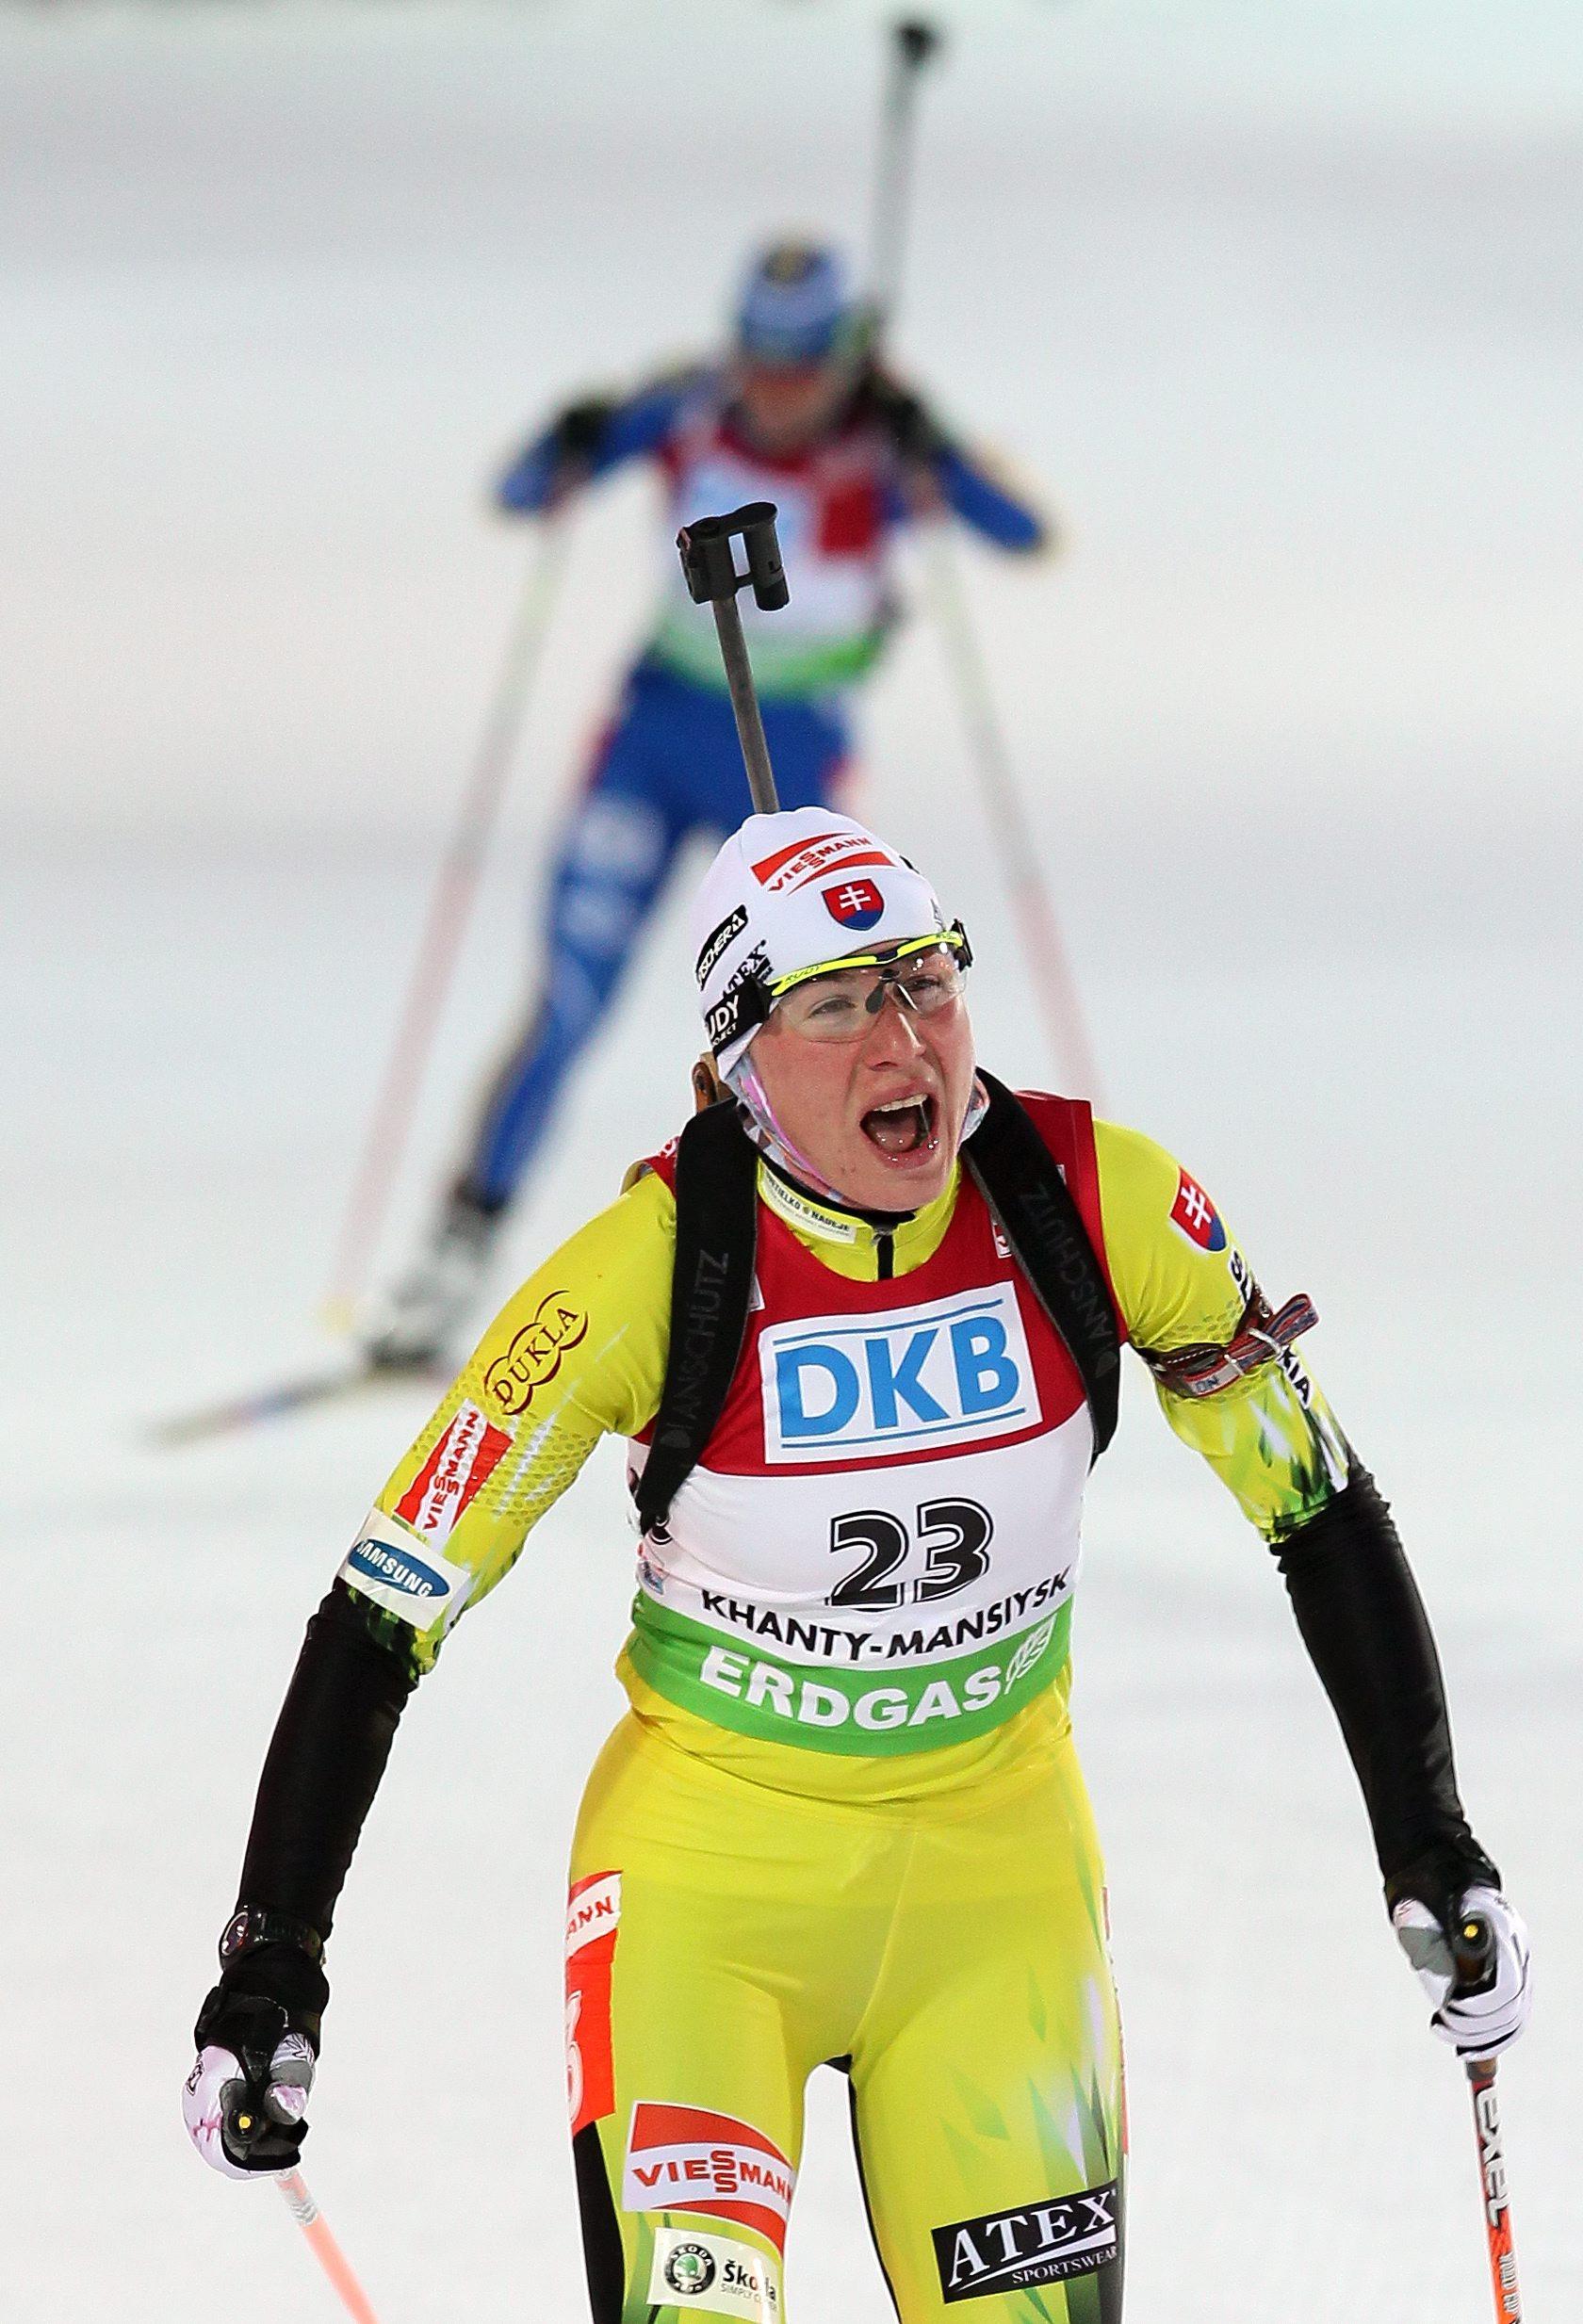 Анастасия Кузмина спечели спринта в Антхолц